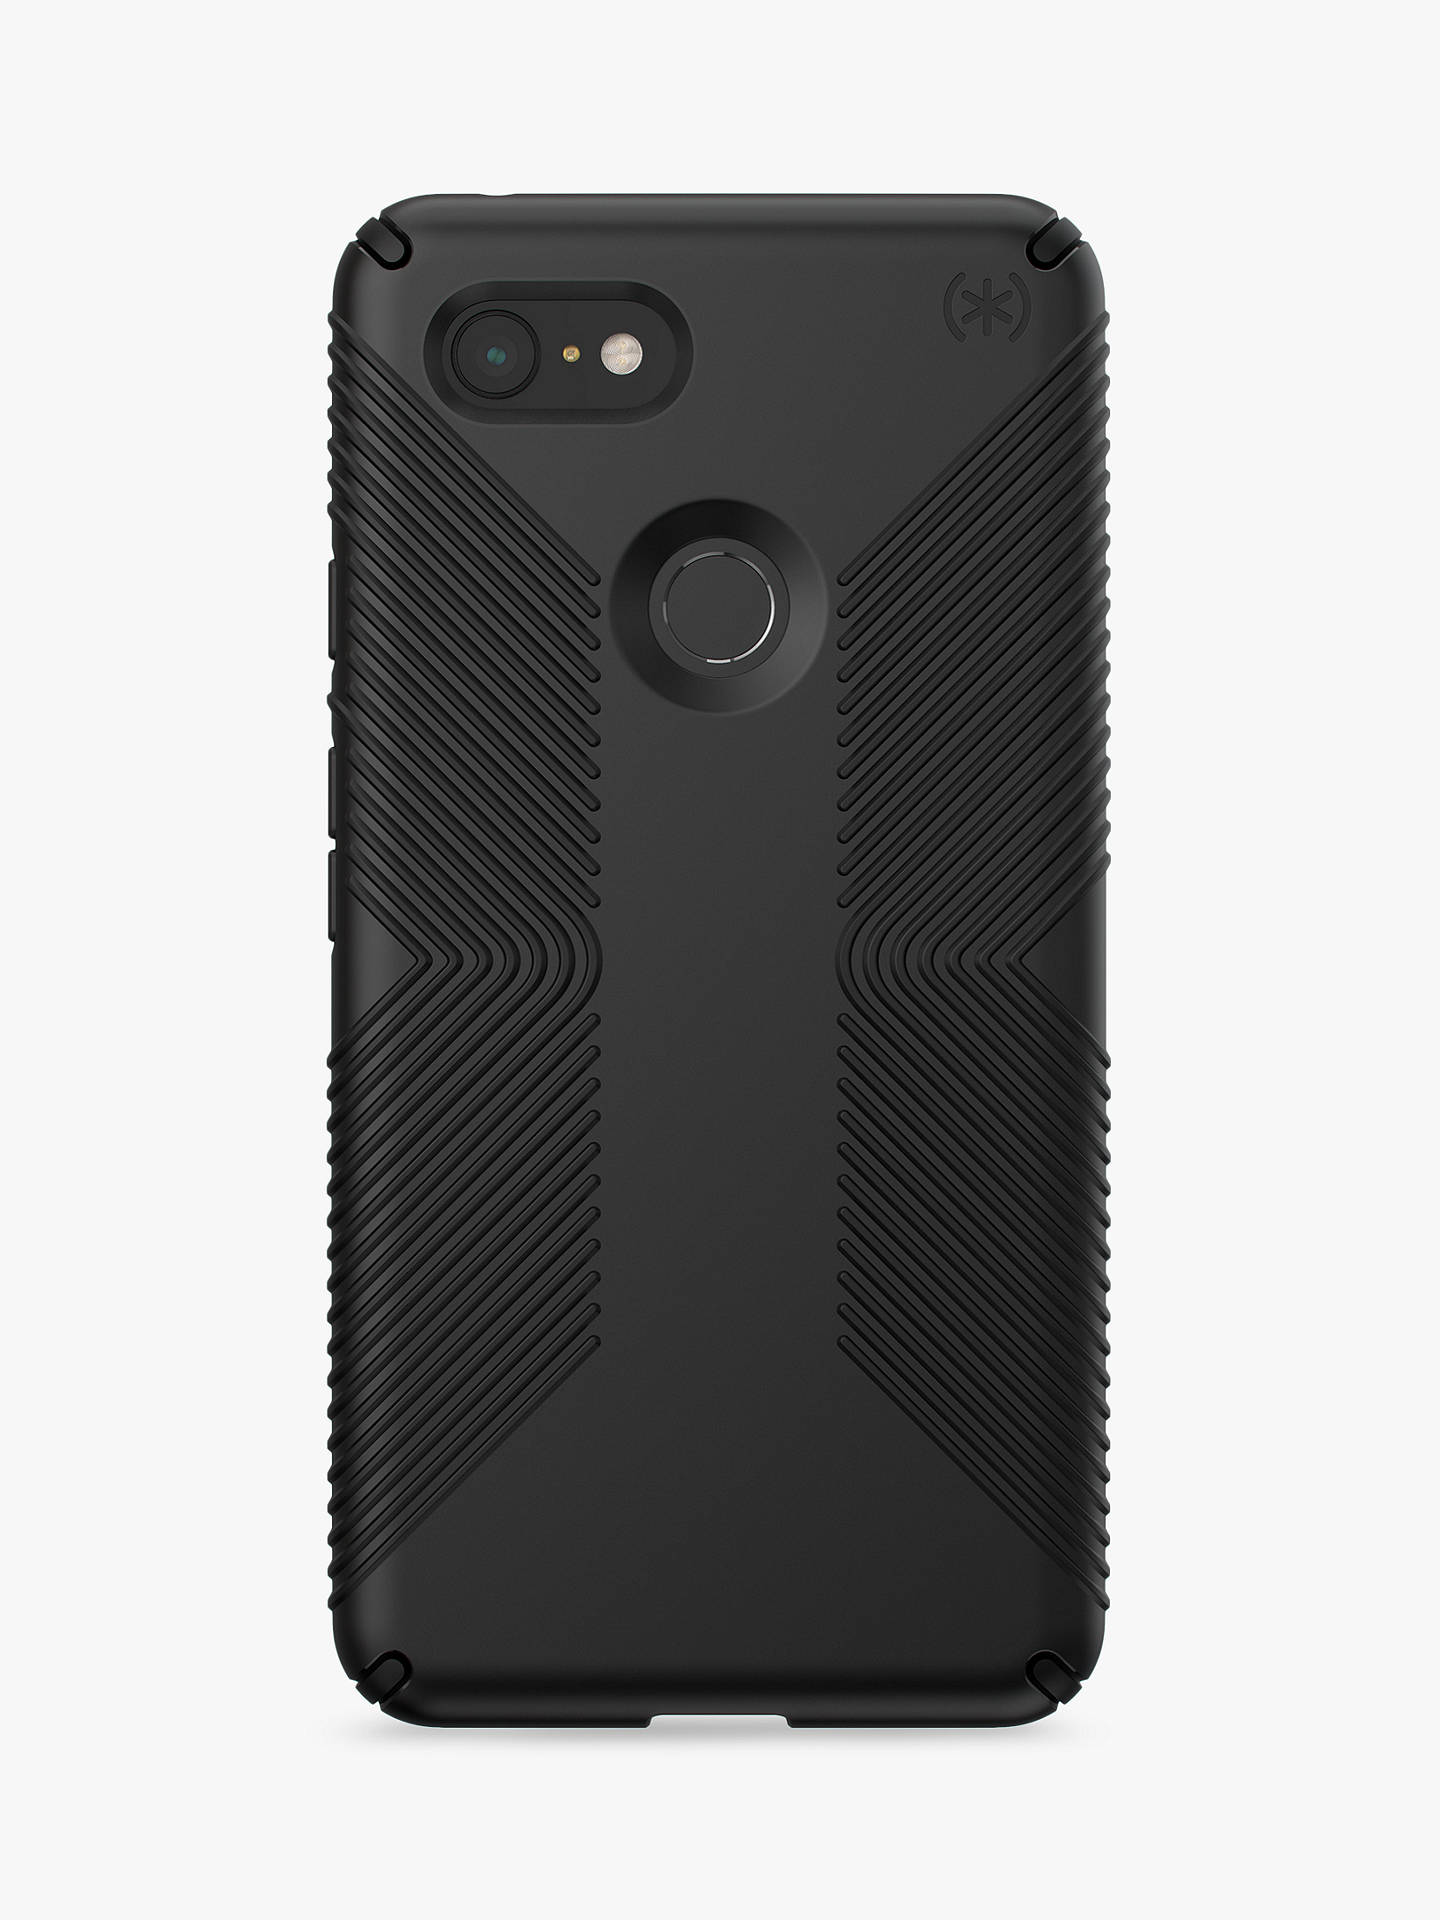 save off 78c14 ceea7 Speck Presidio Case for Google Pixel 3 XL